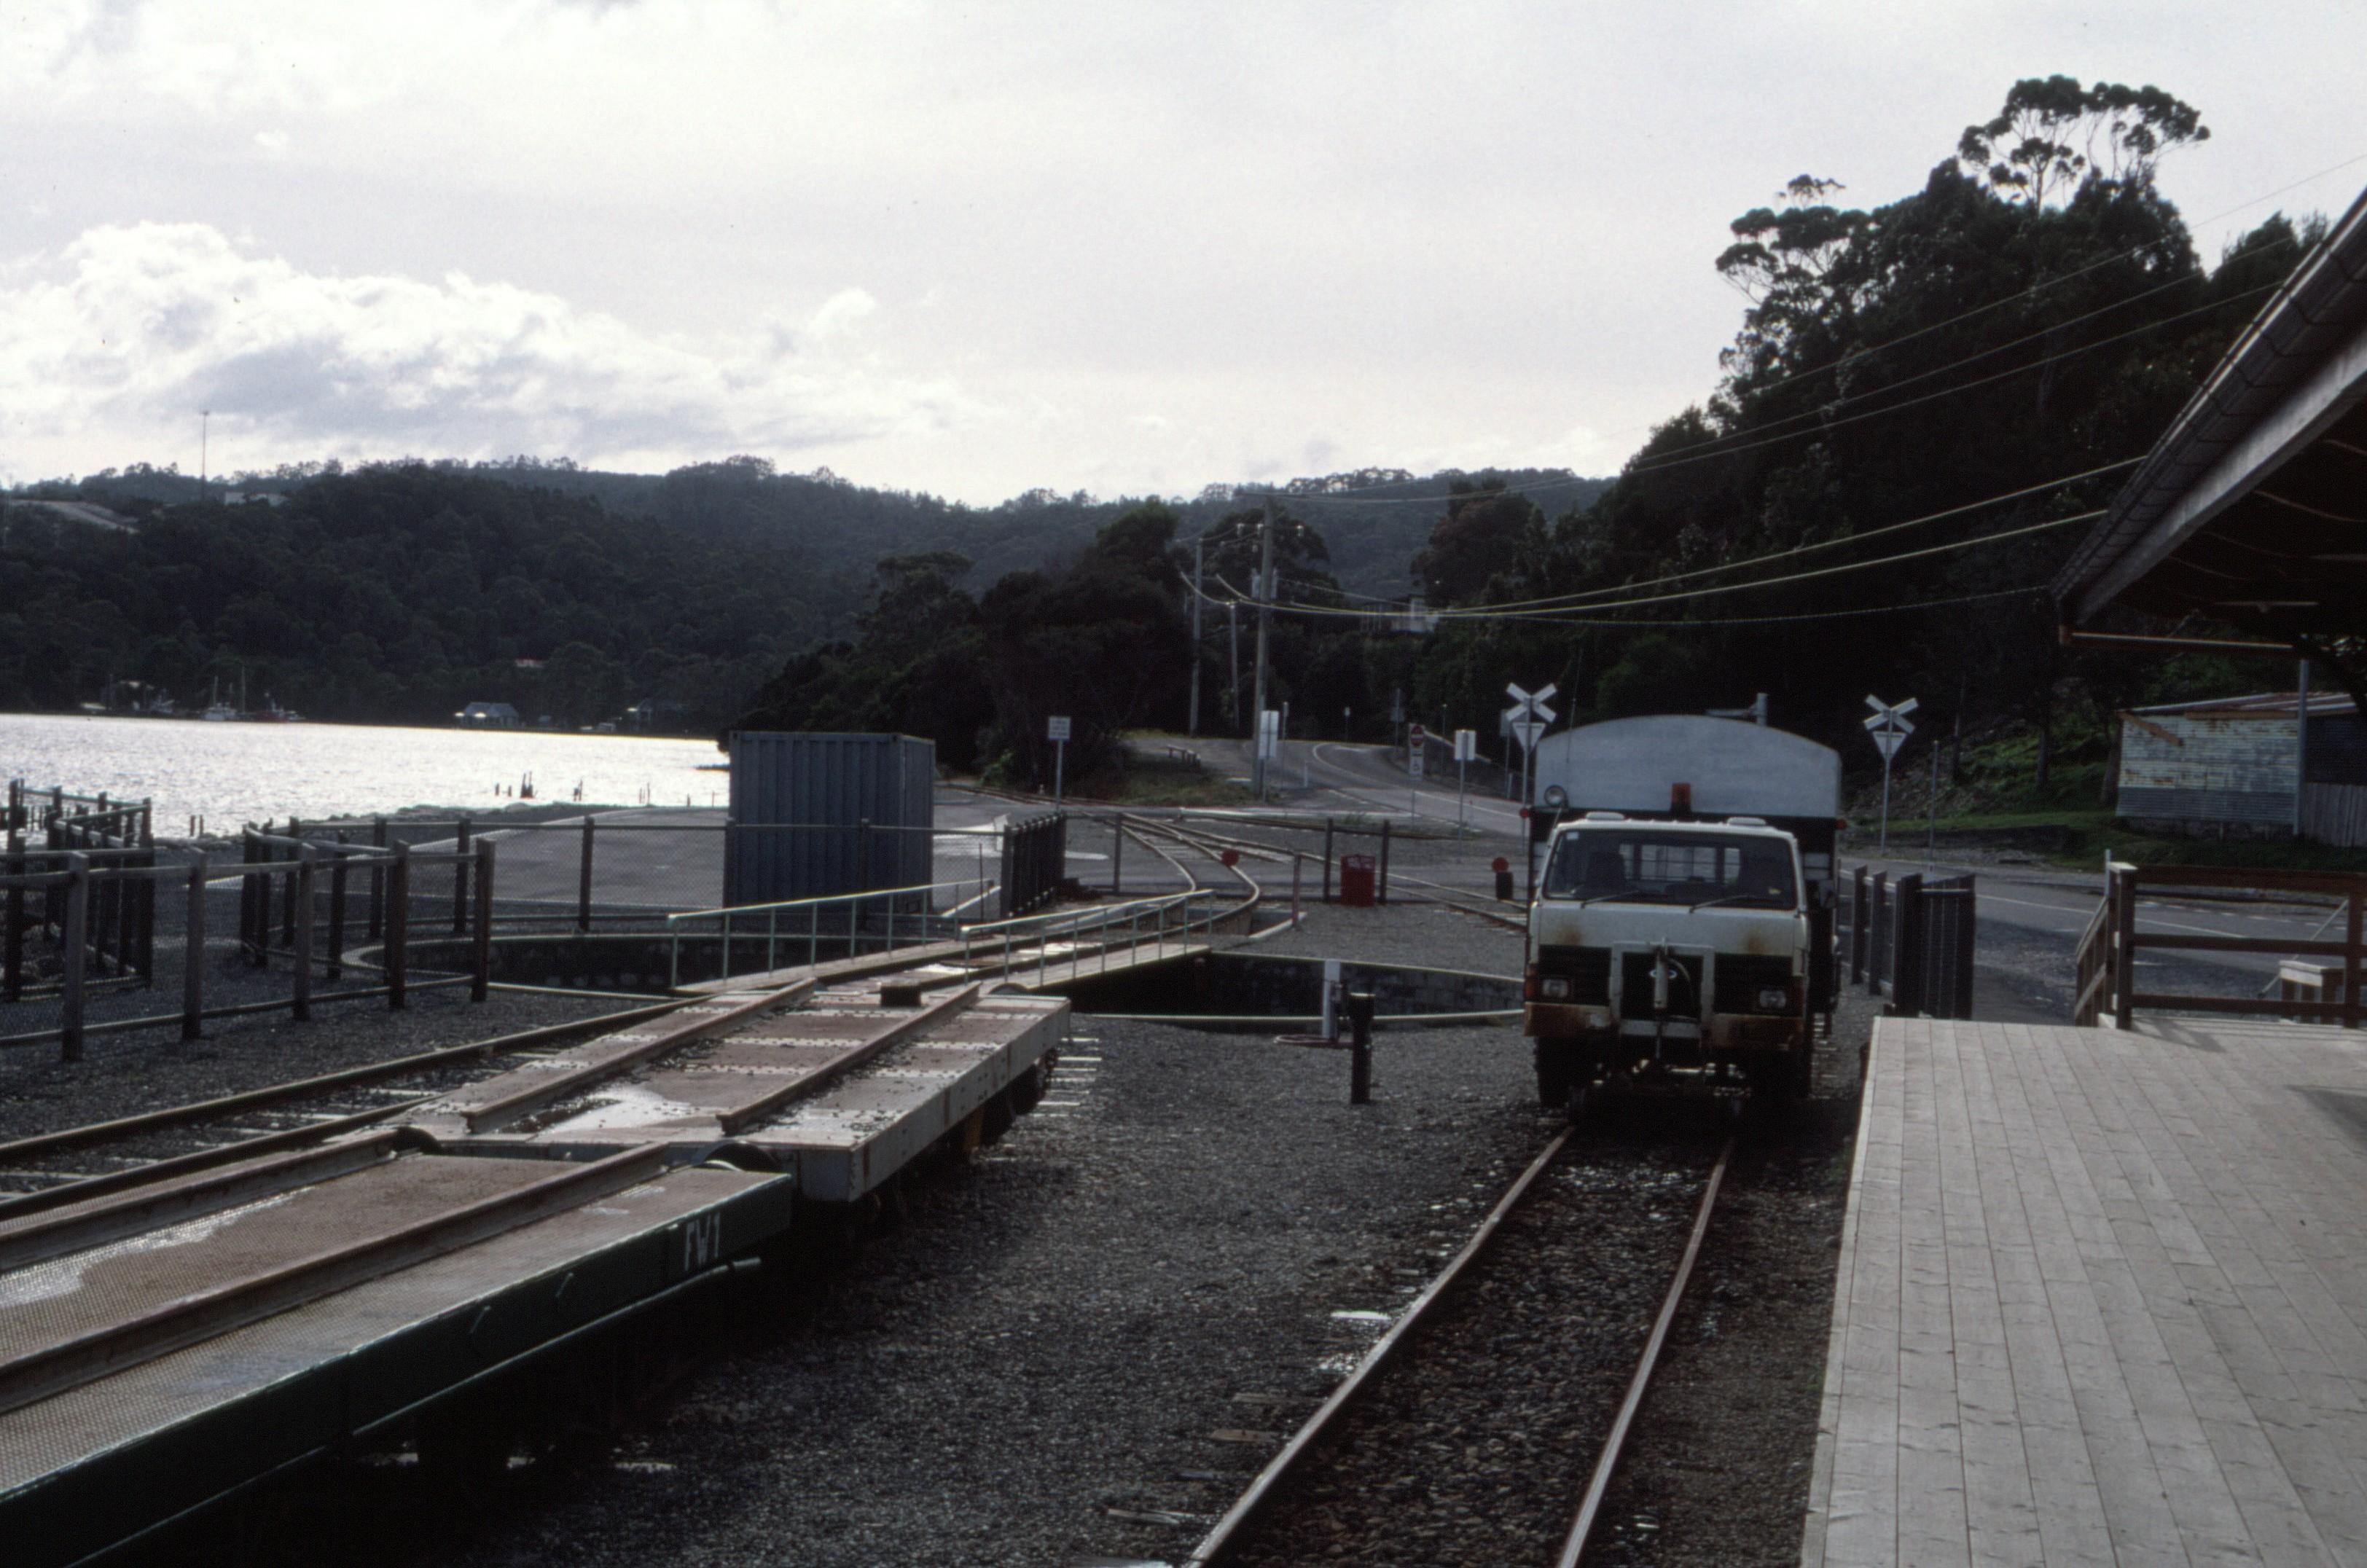 Weston Langford - 128754: Regatta Point Hi-Rail Inspection Vehicle